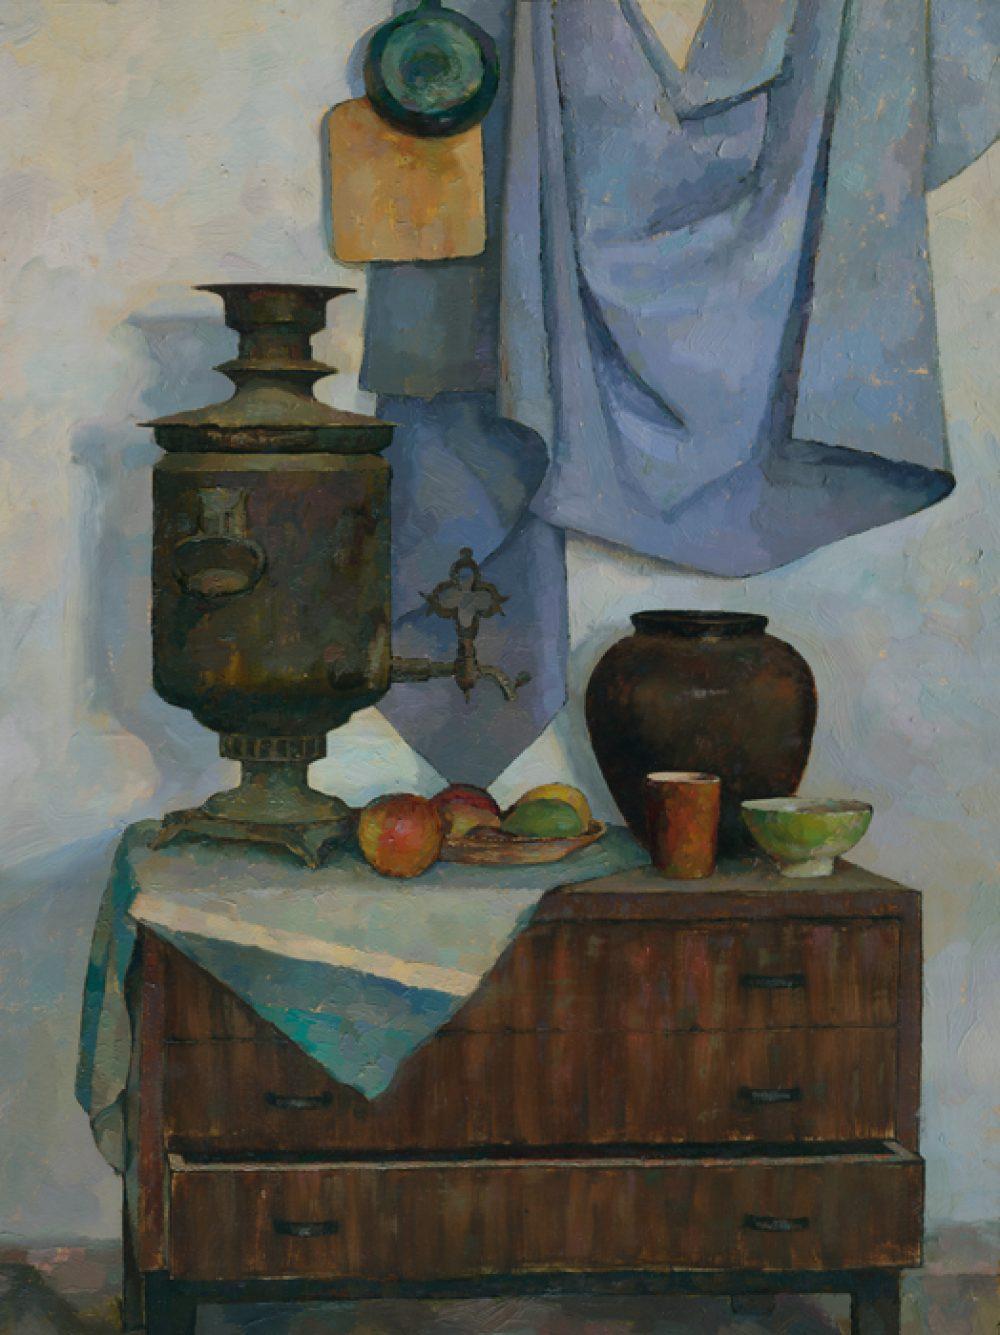 Still life with samovar - oil painting by Daniil Belov.